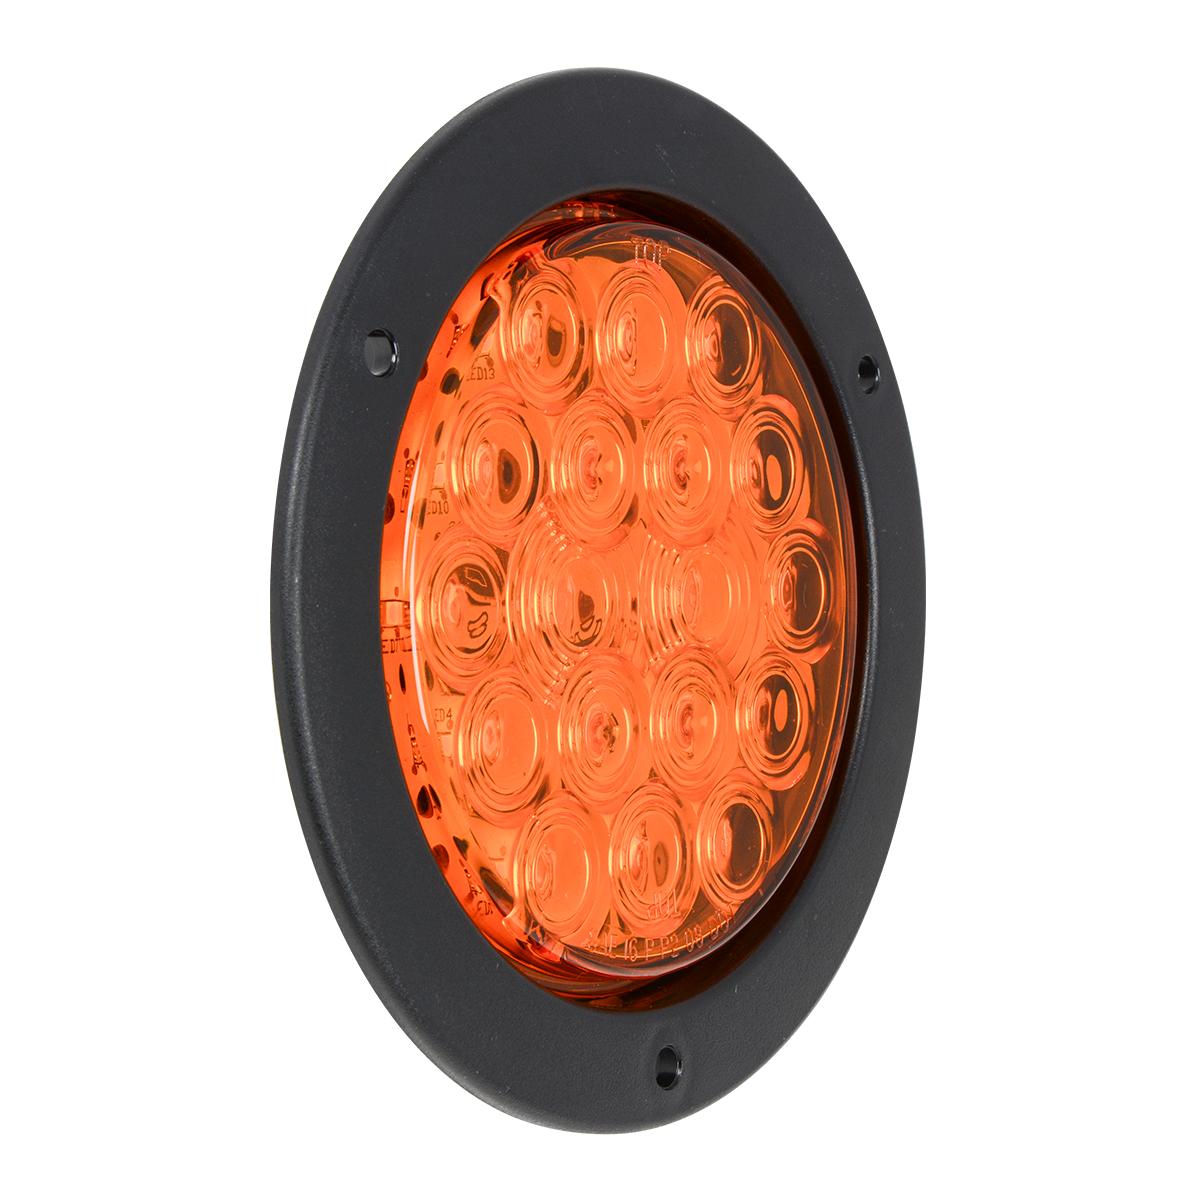 "75890 4"" Fleet LED Light with Black Flange Mount in 3 Wires"